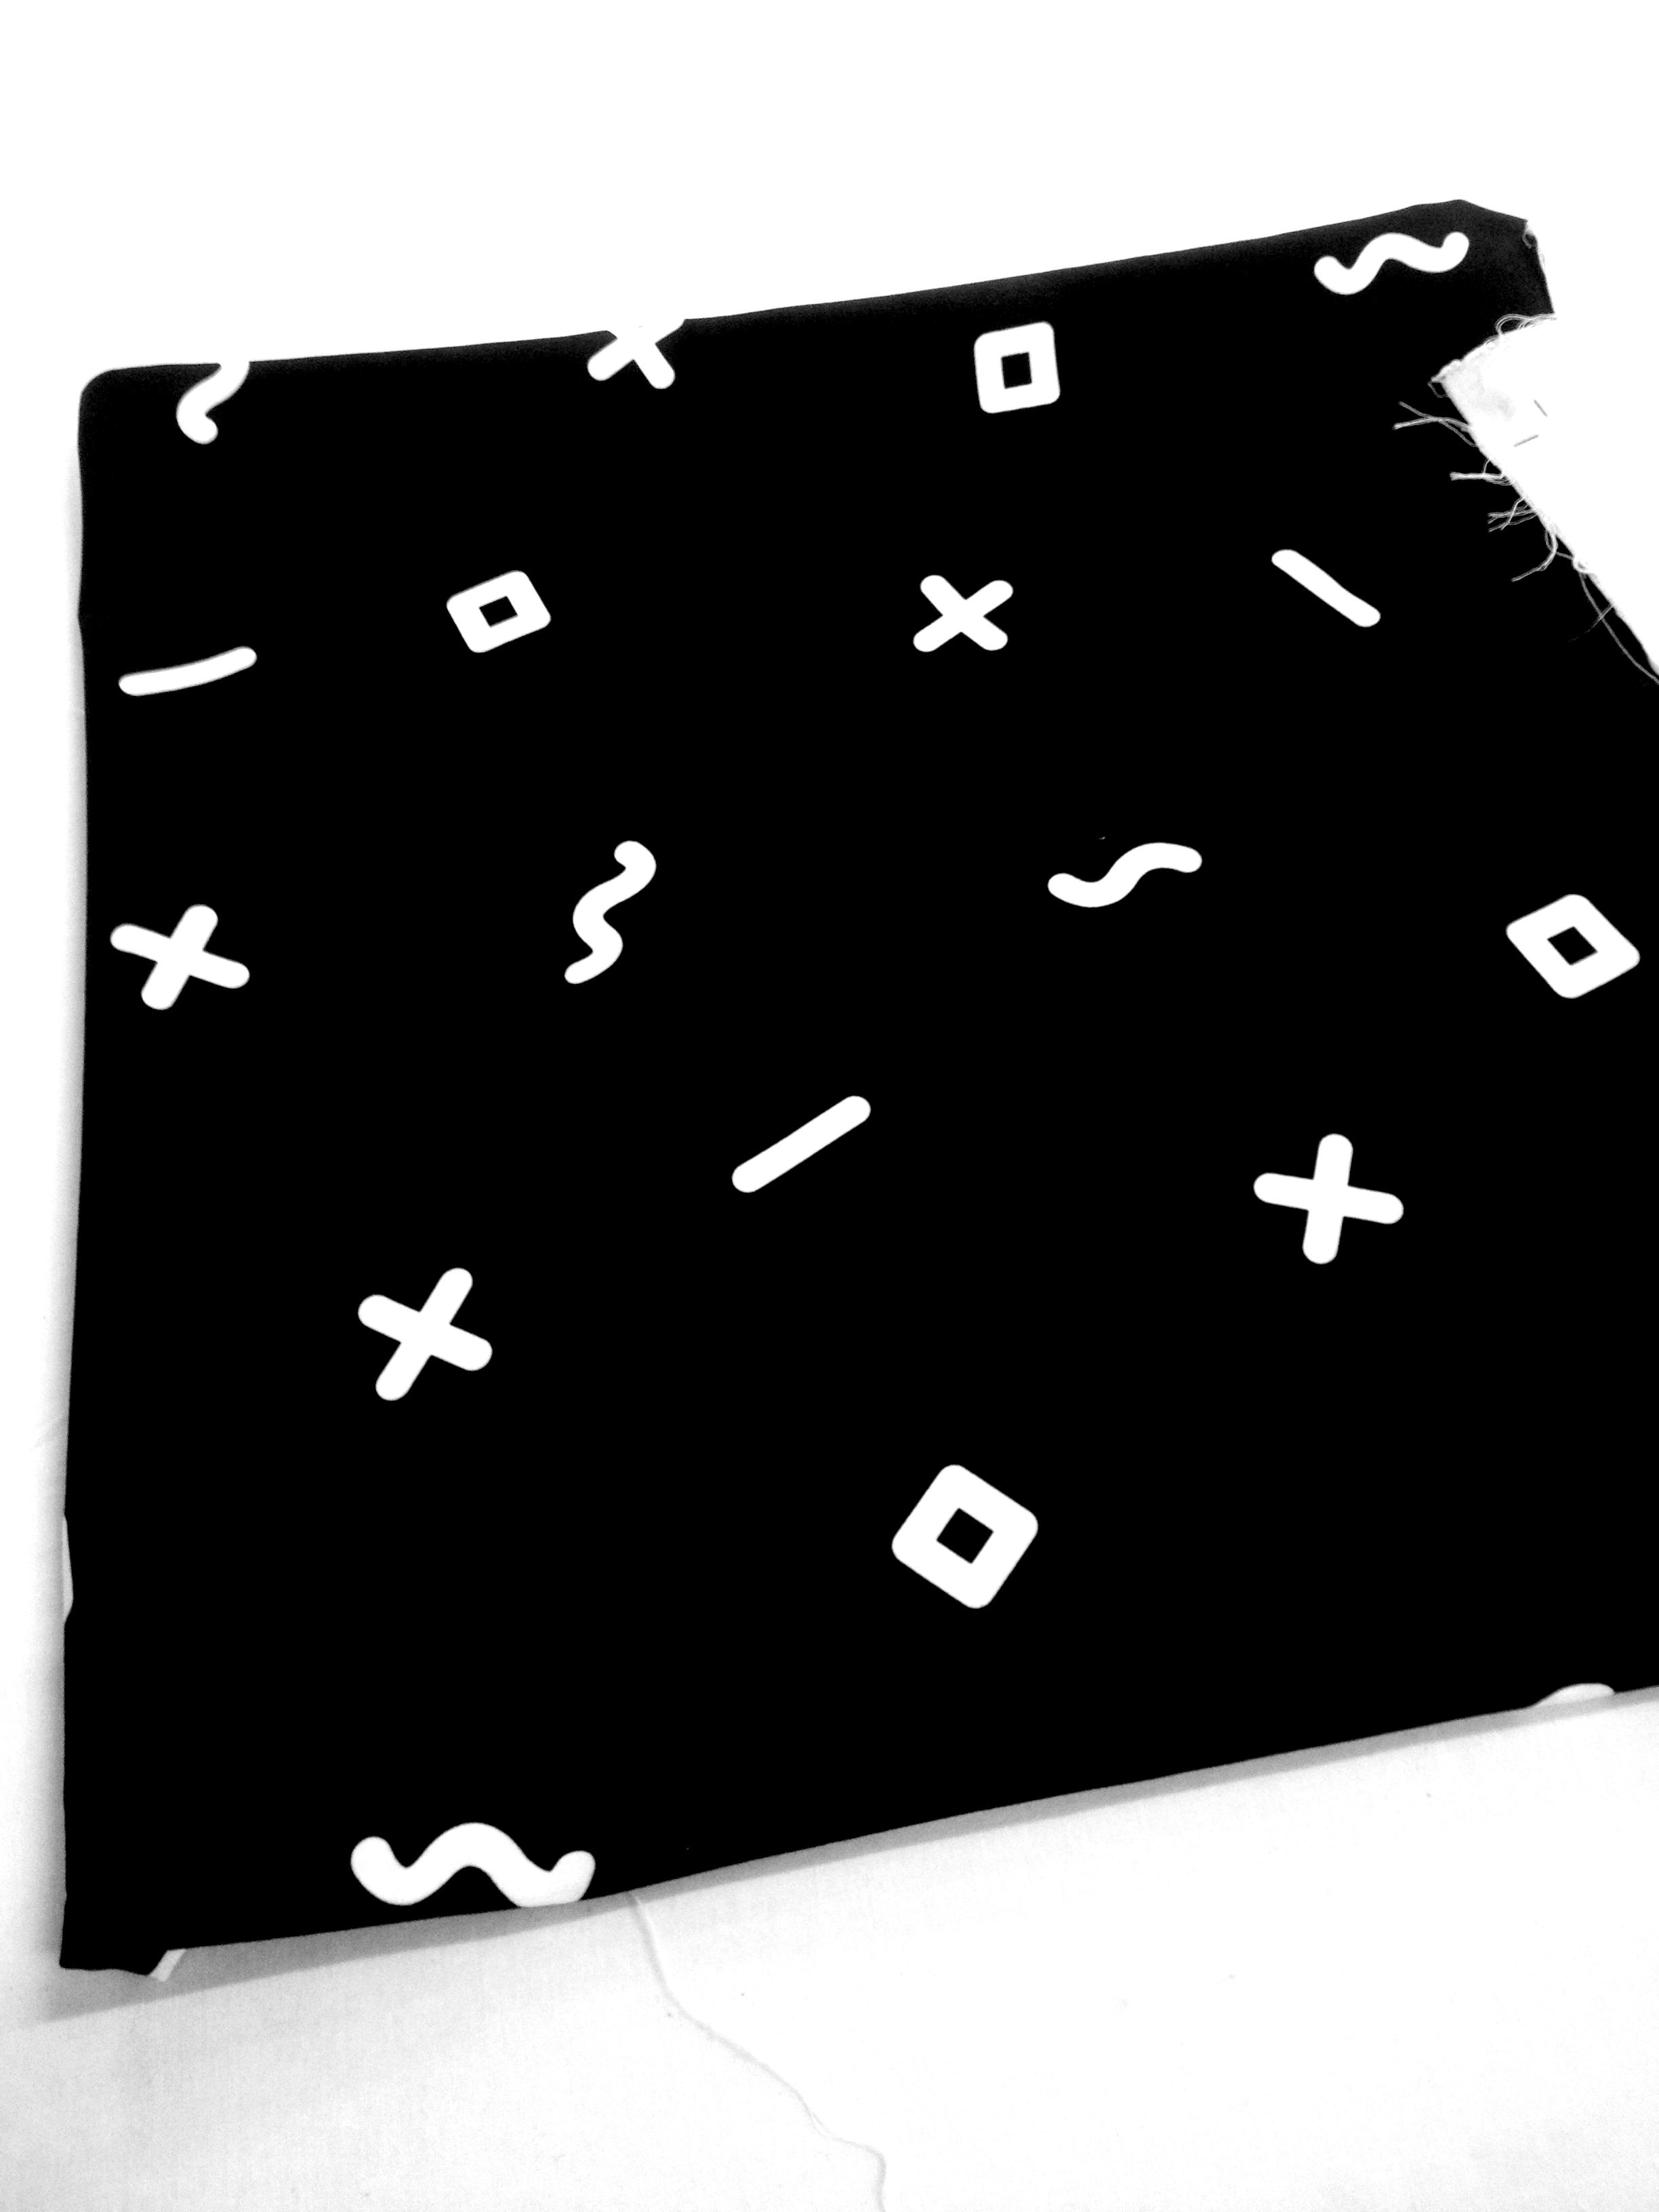 processtextile_1